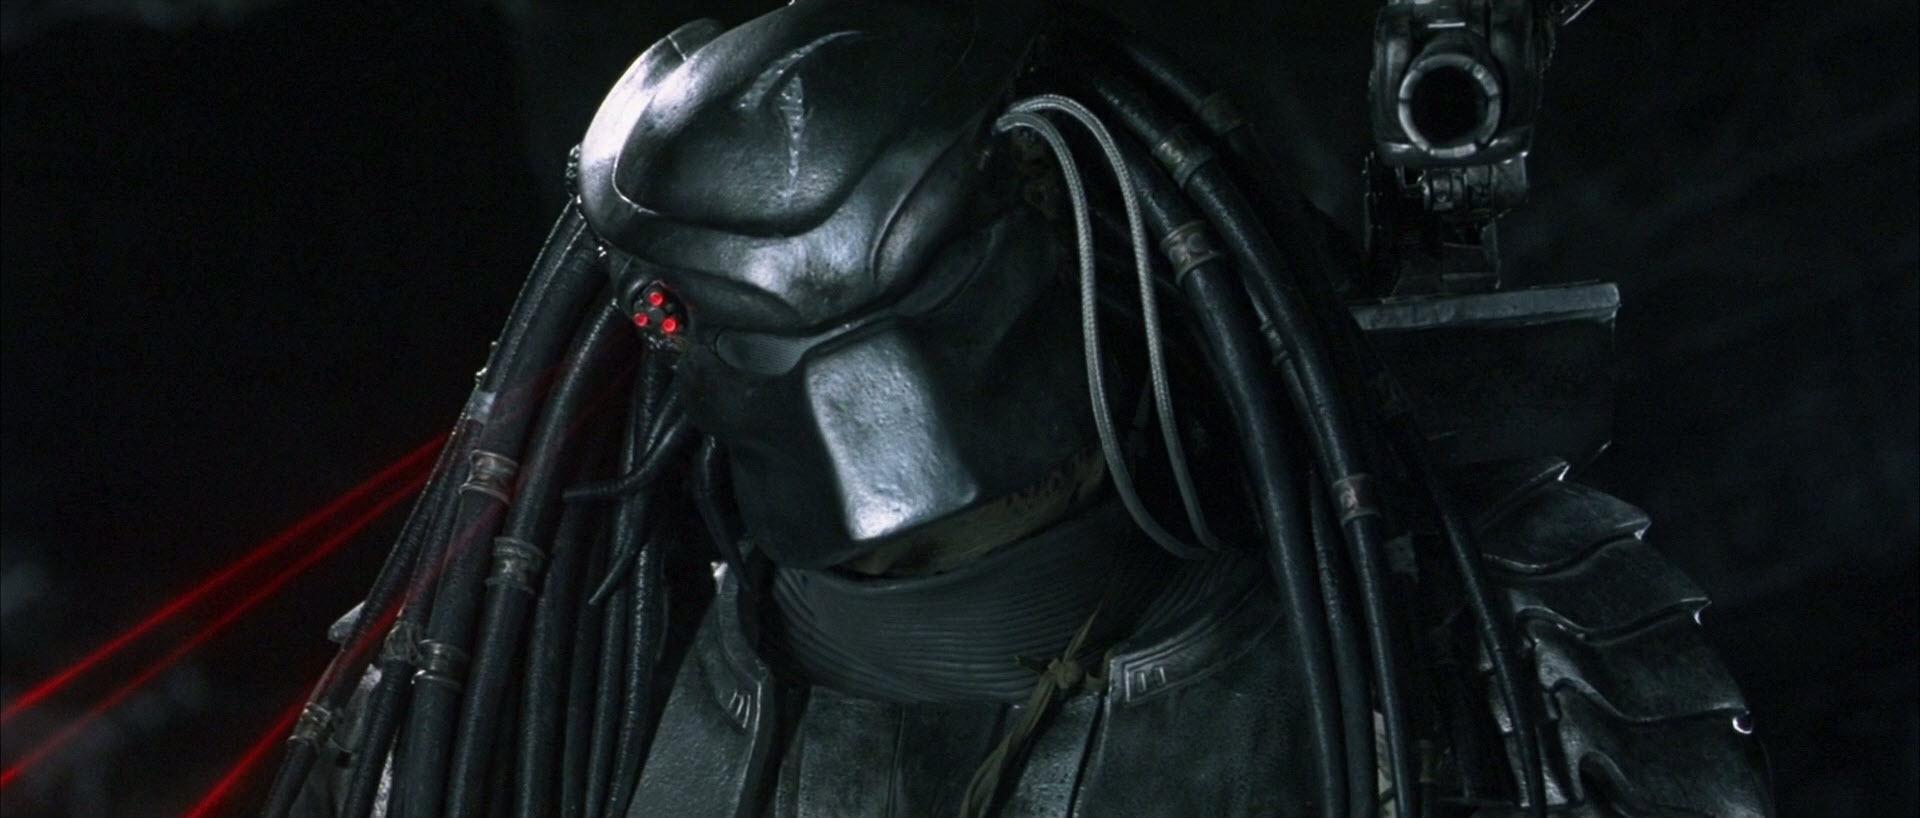 avp alien vs predator movie review paul anderson avpgalaxy